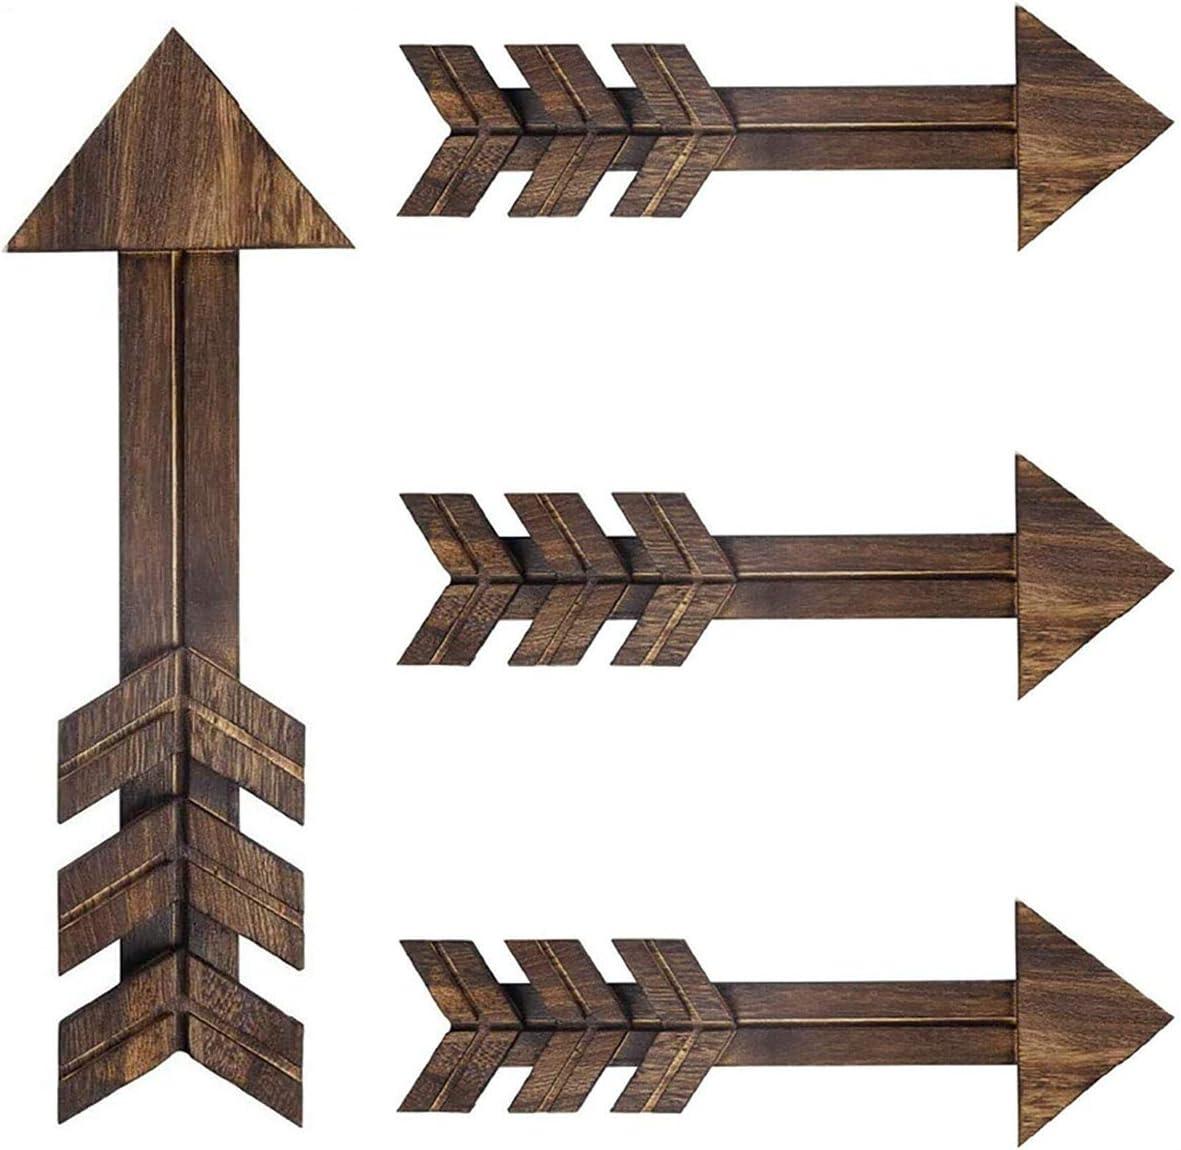 Ekotech Rustic Wood Arrow Sign Wall Decor,15